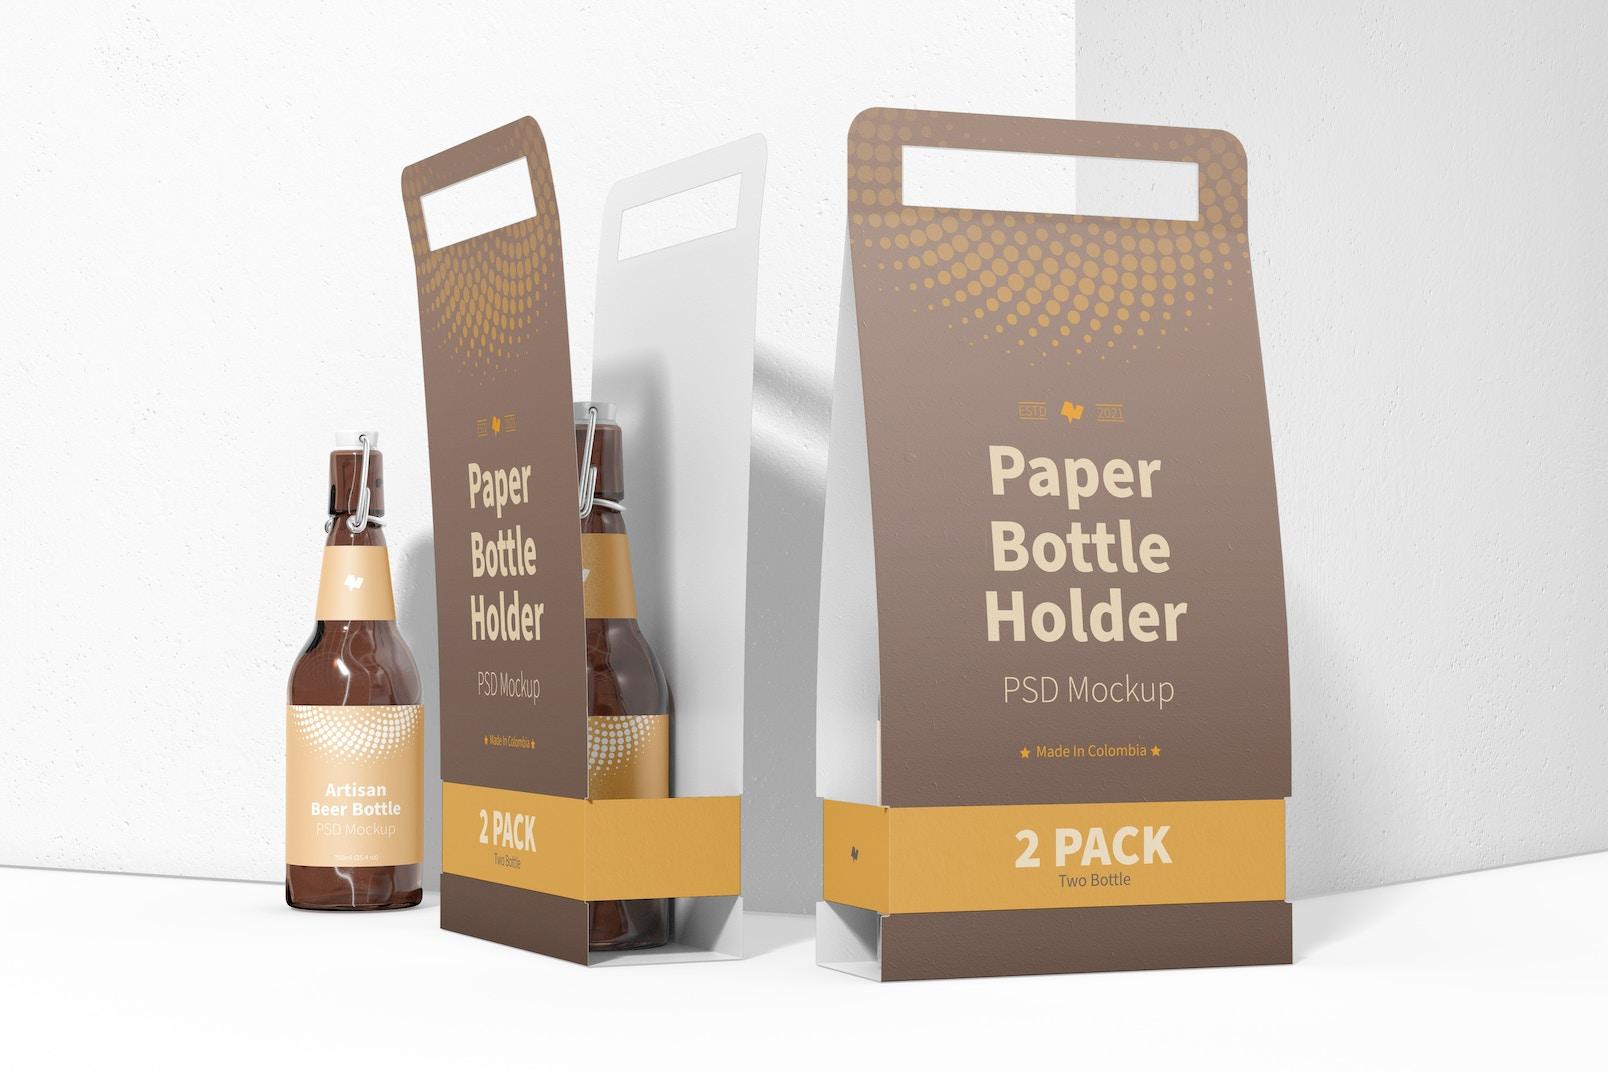 2 Pack Paper Bottle Holders Mockup